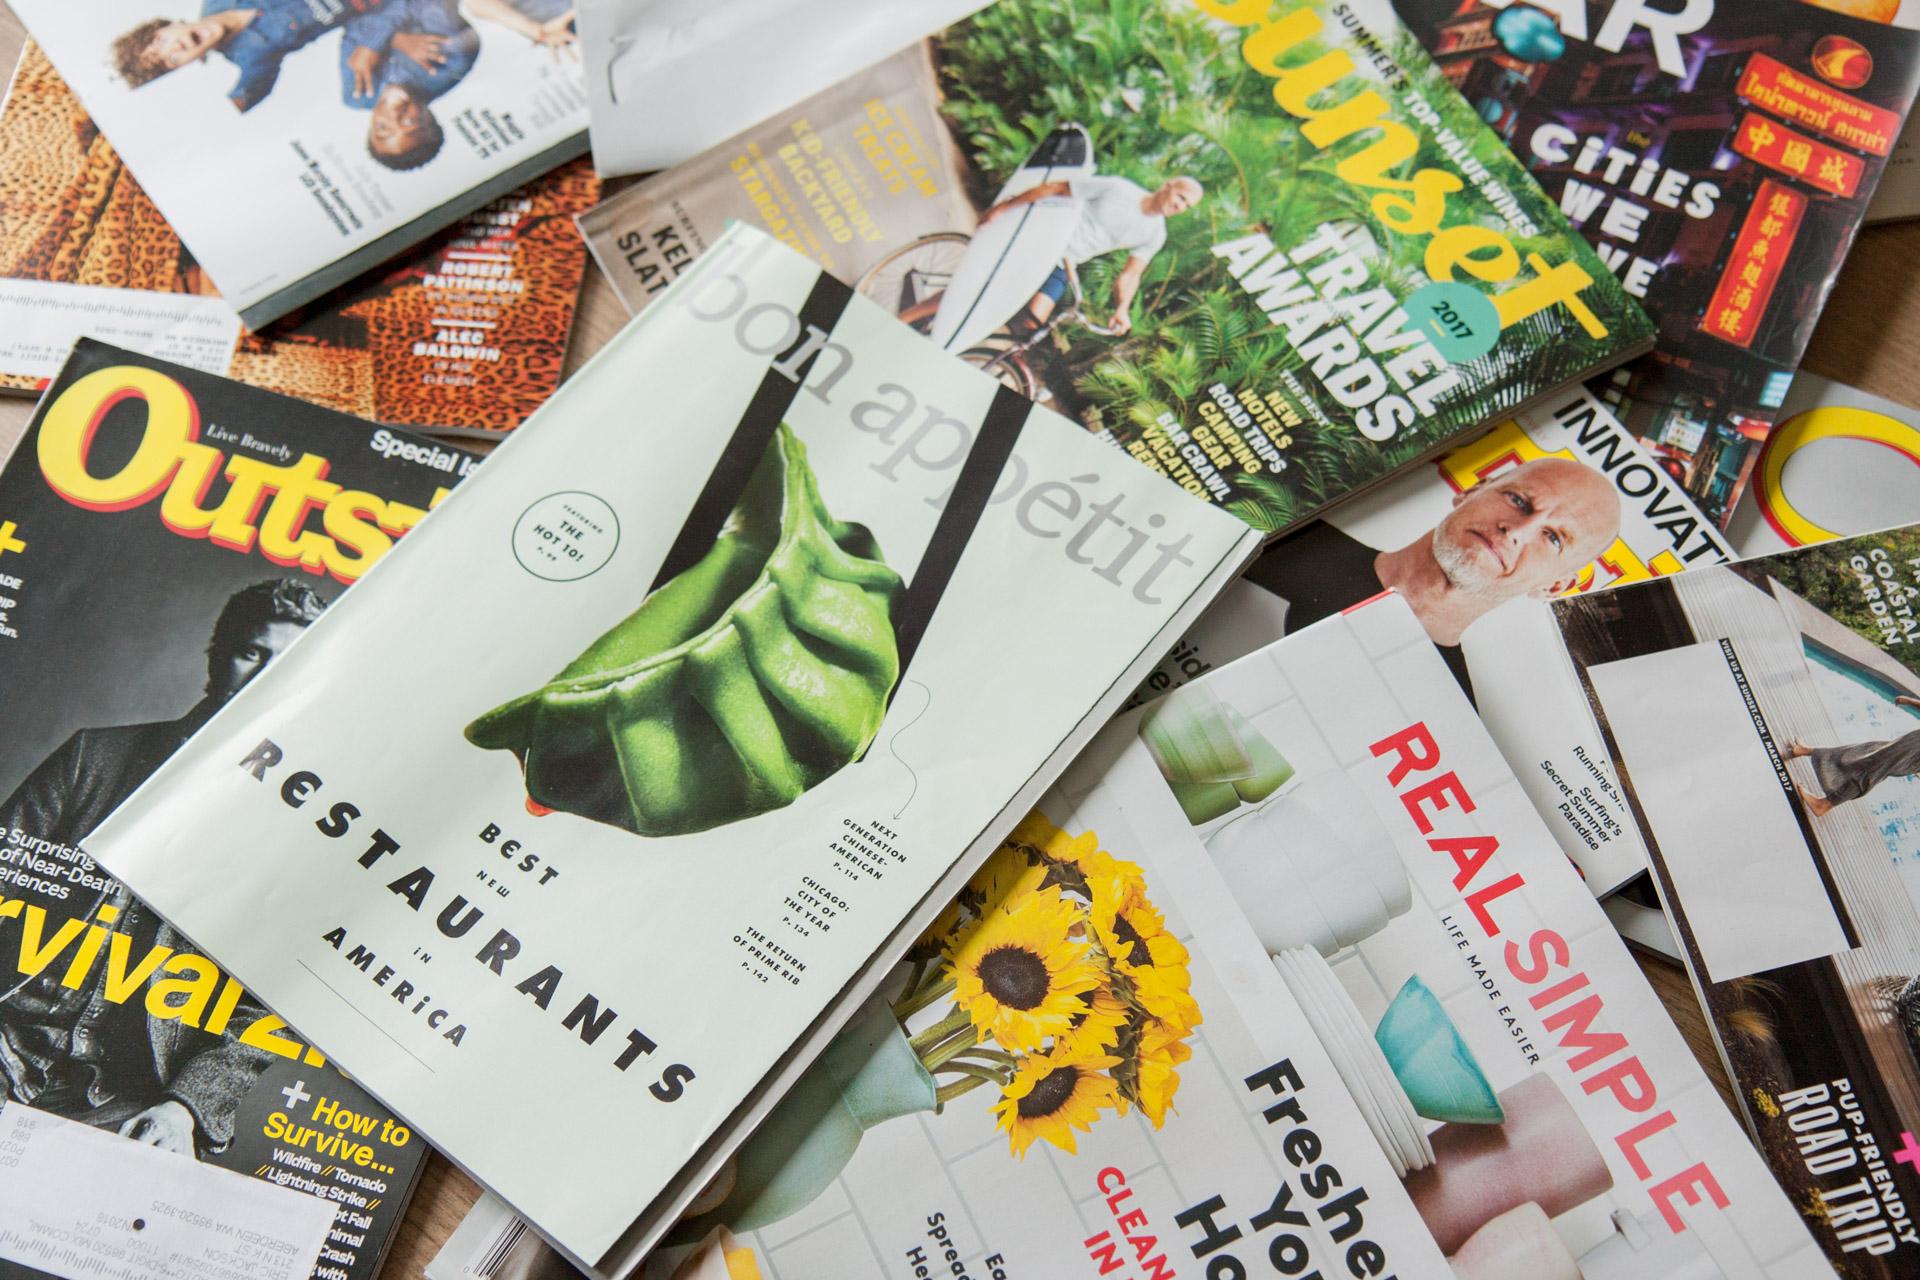 Bauer Media axes eight magazines